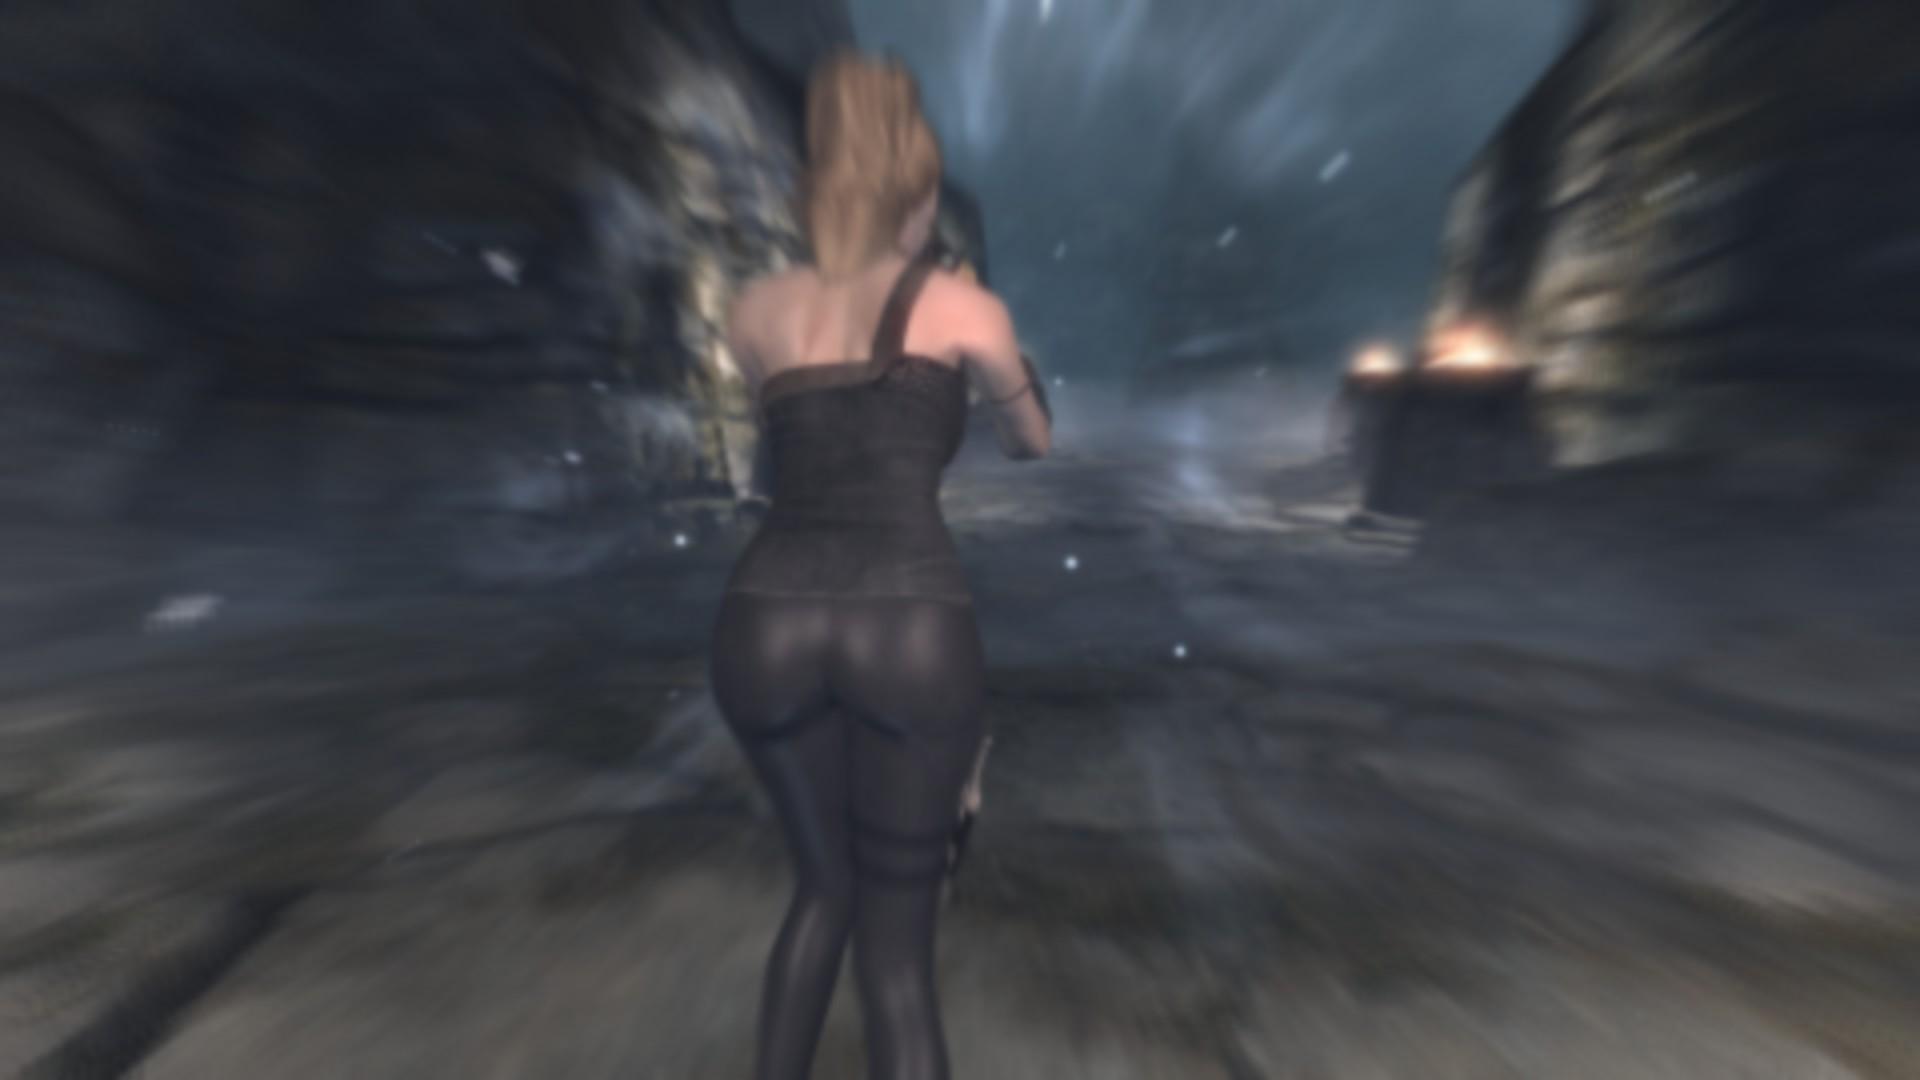 20180723194259_1.jpg - Elder Scrolls 5: Skyrim, the